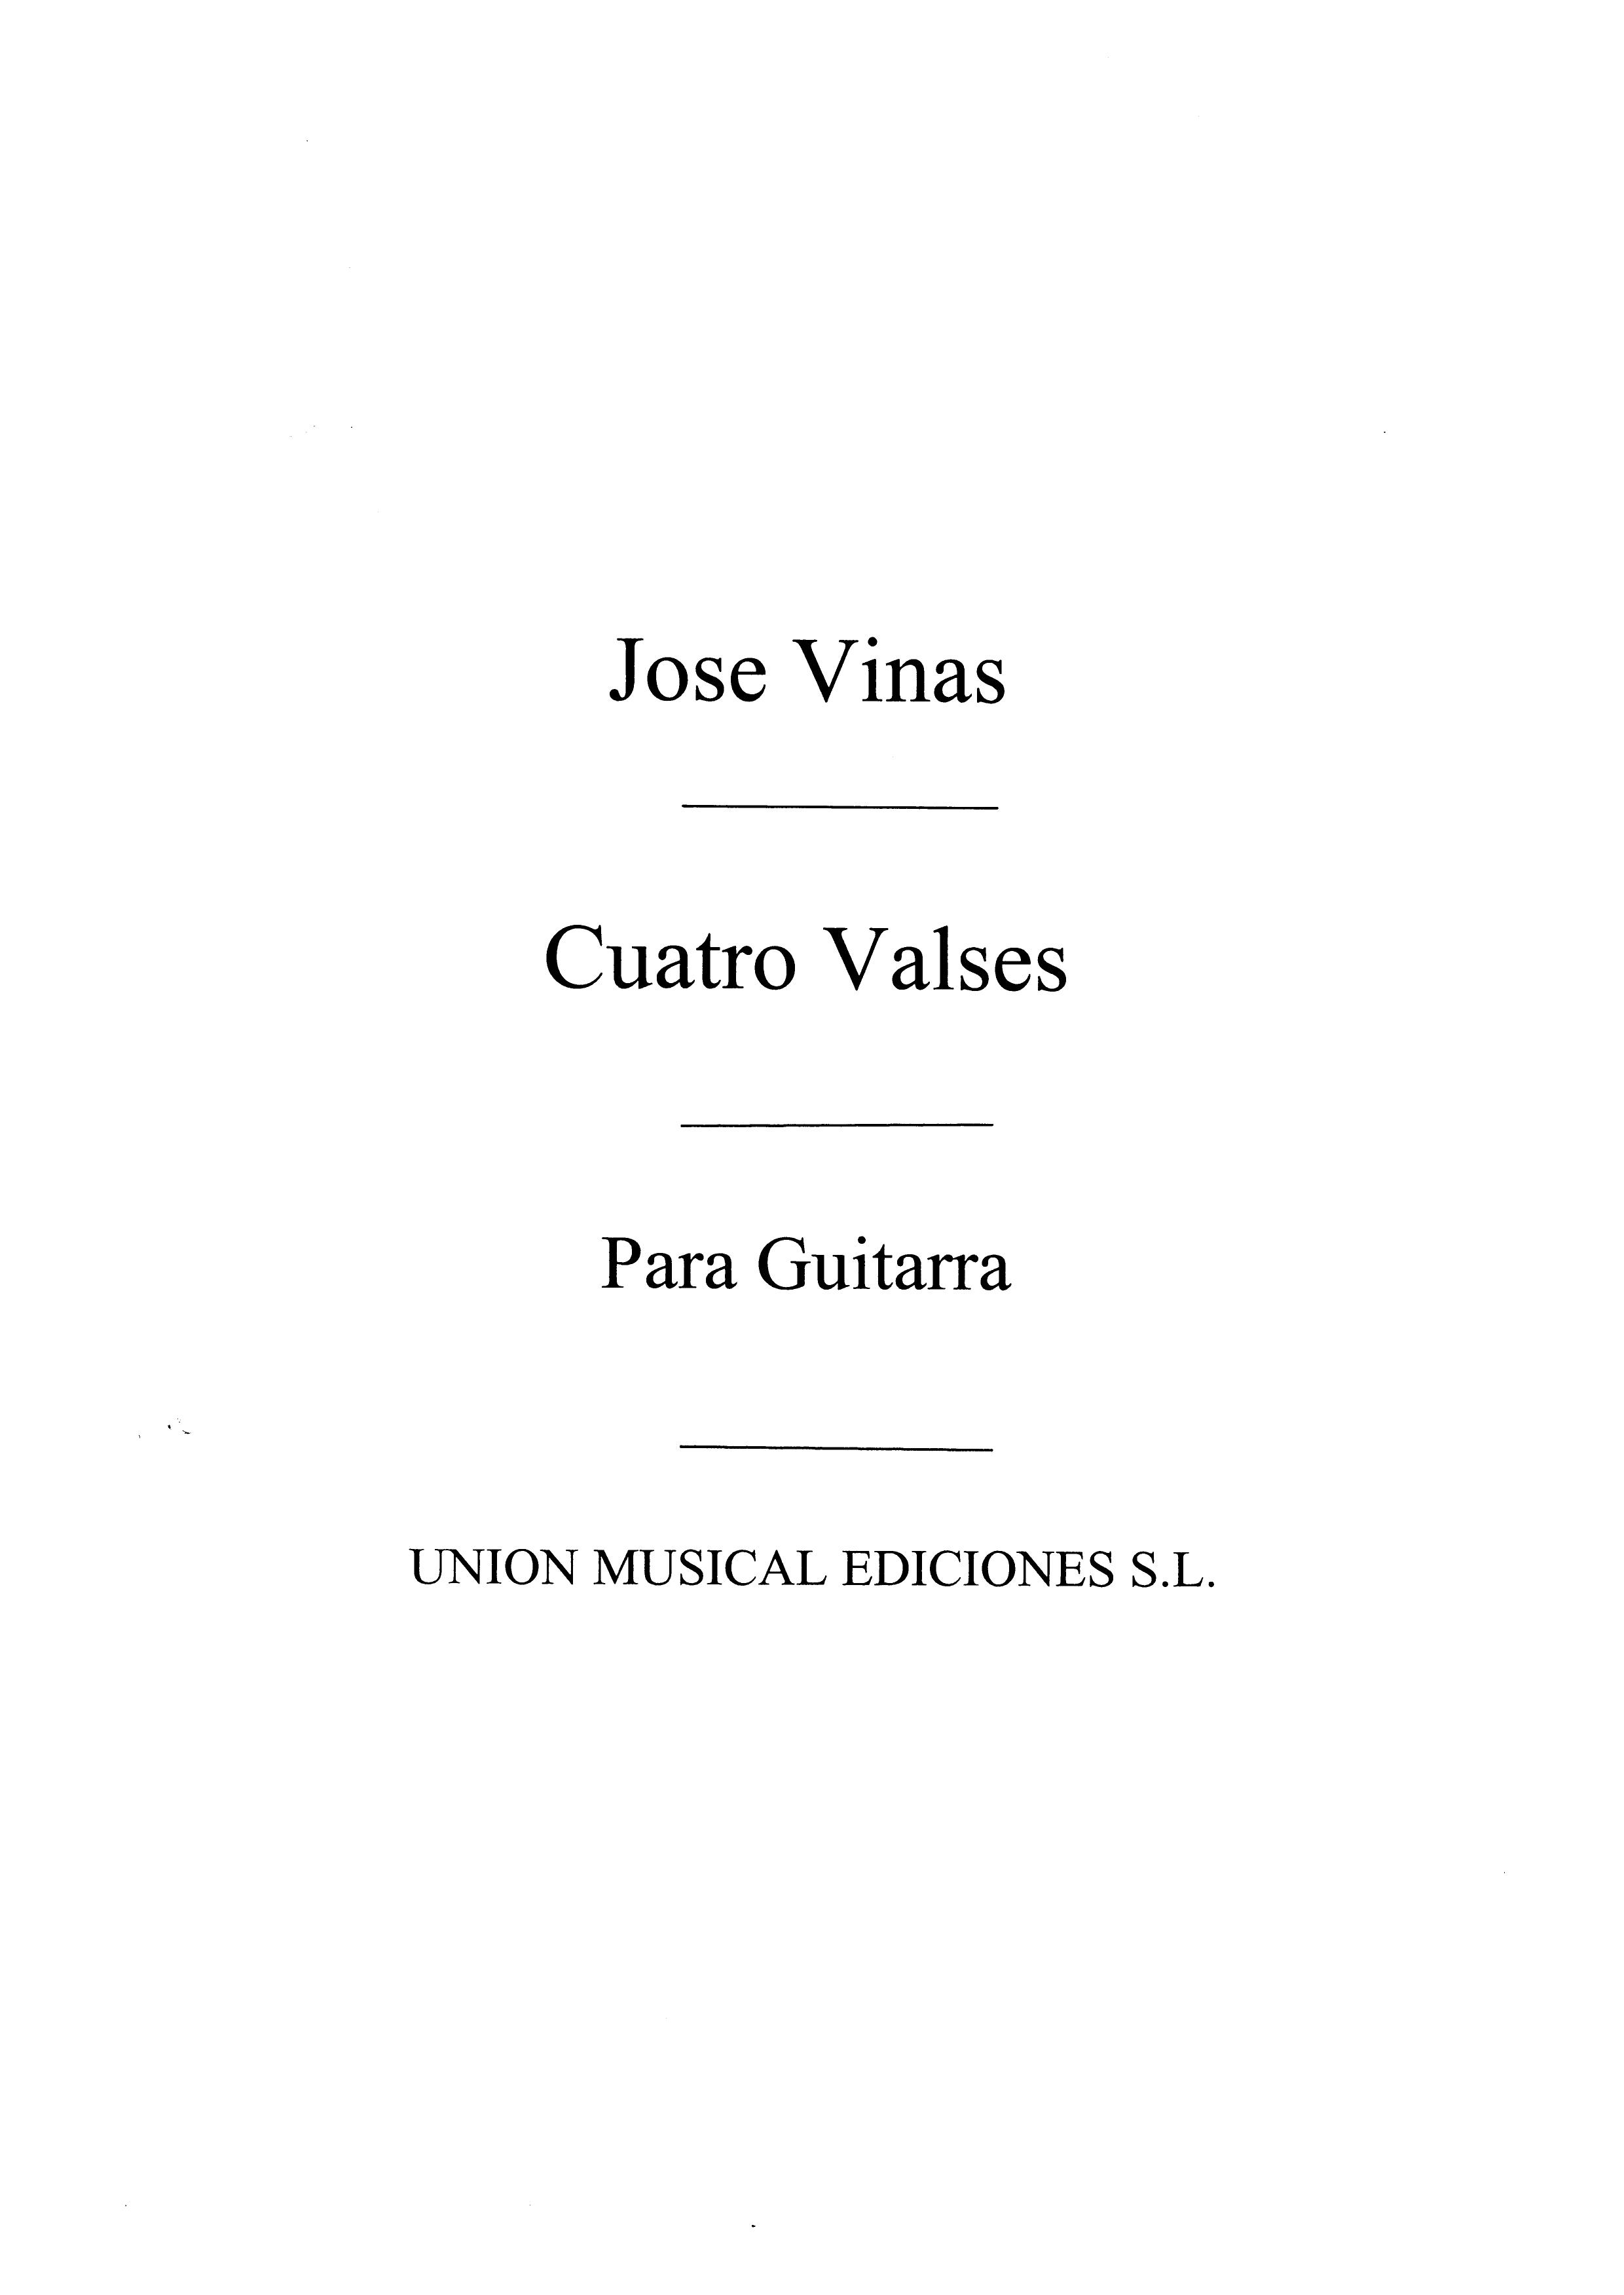 José Vinas: Cuatro Valses: Guitar: Instrumental Work